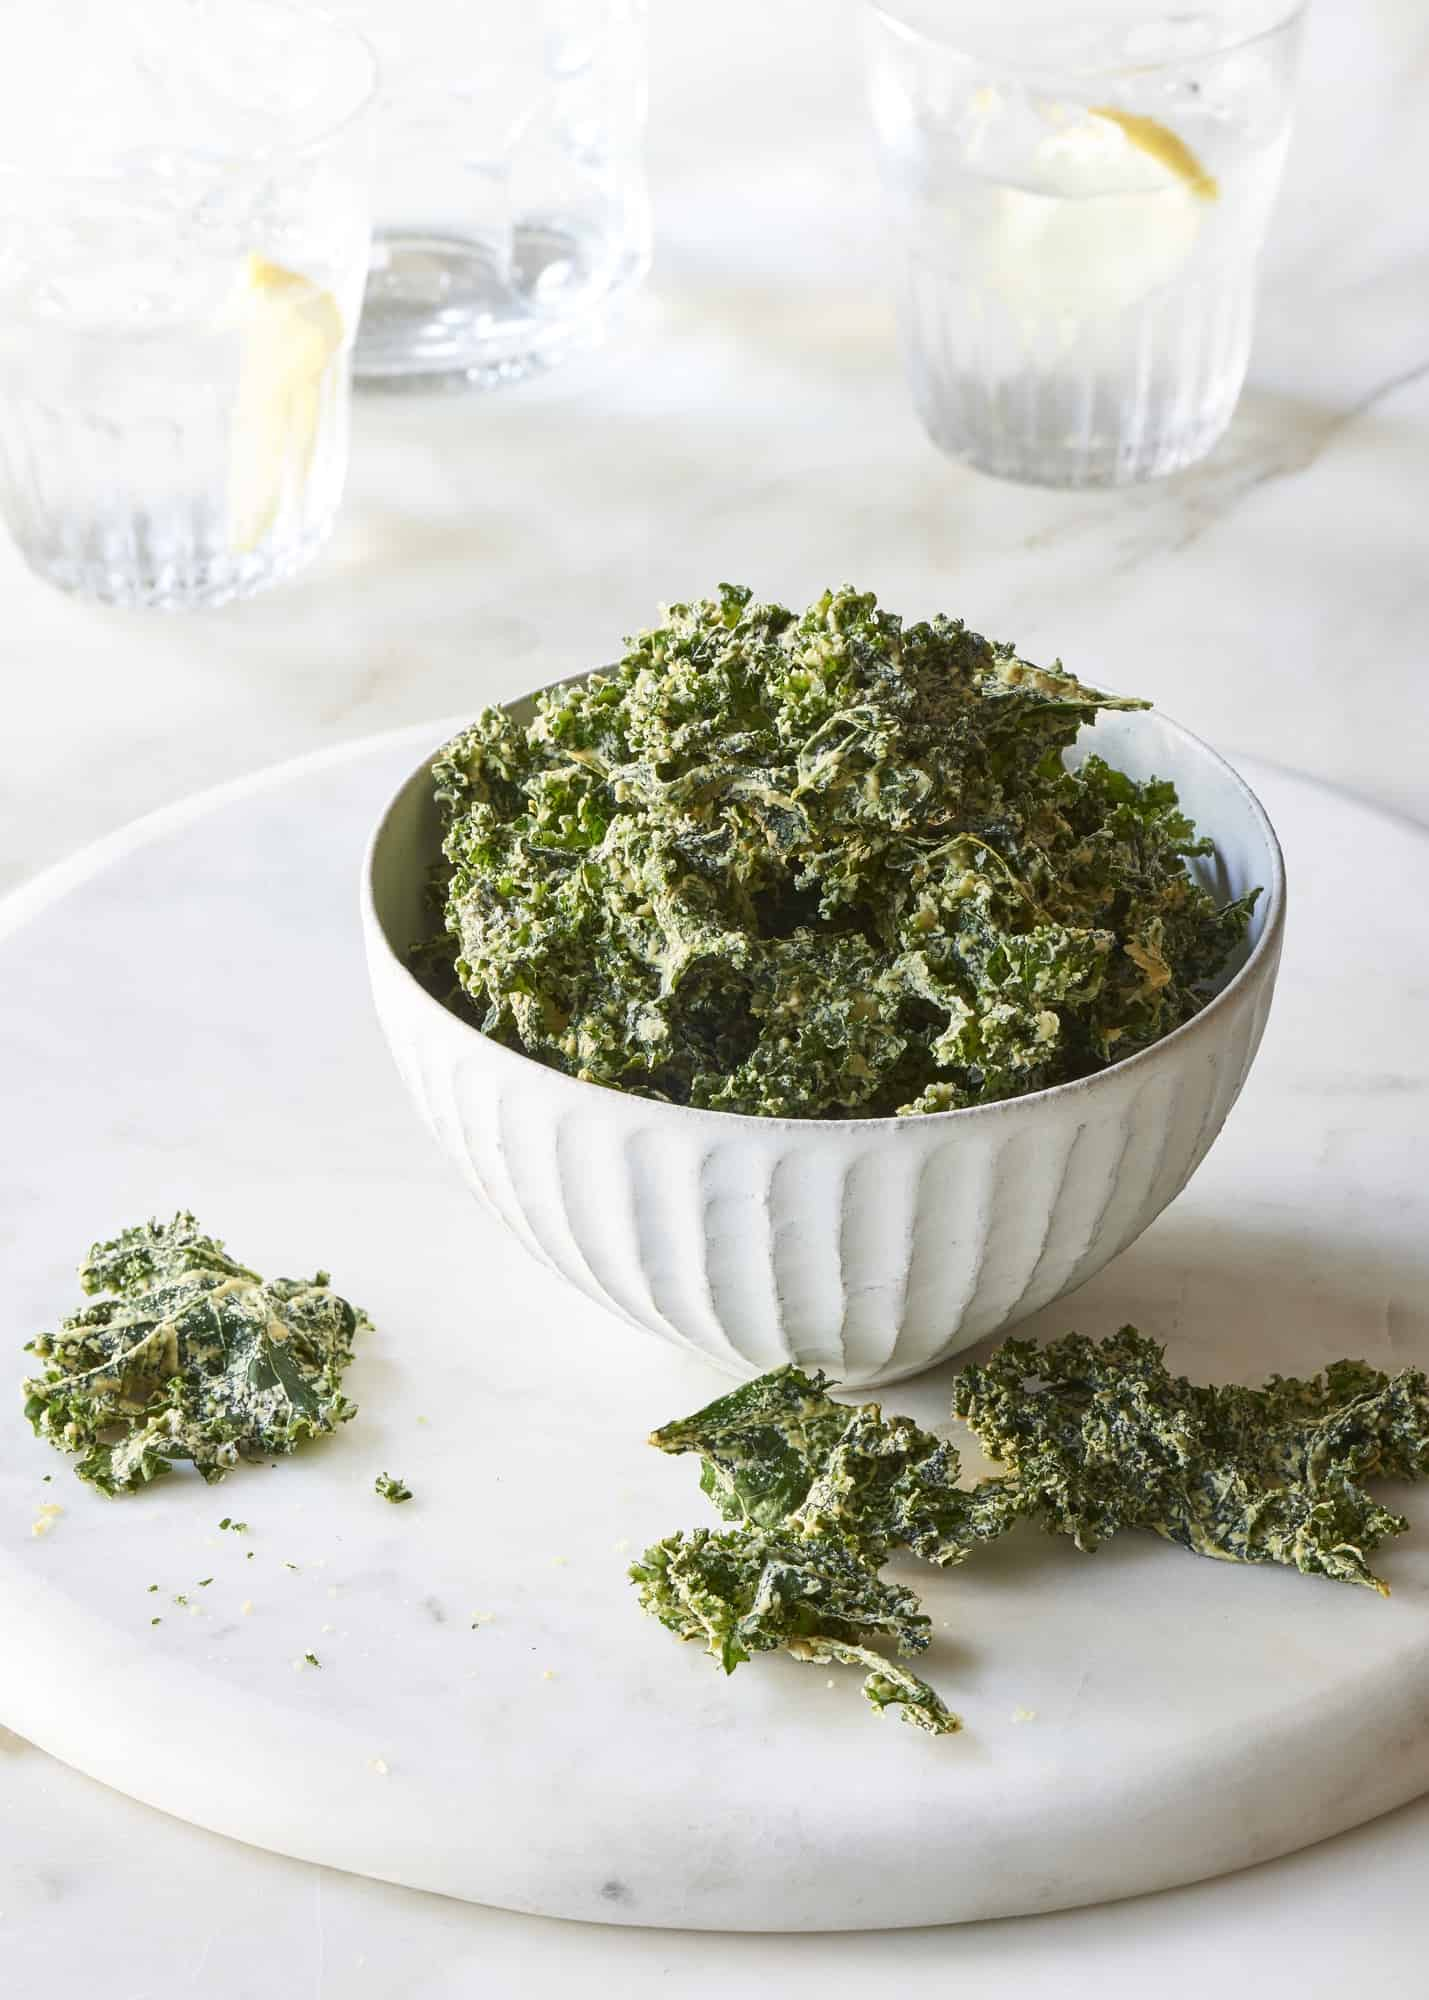 Garlic Kale Chips The Blender Girl